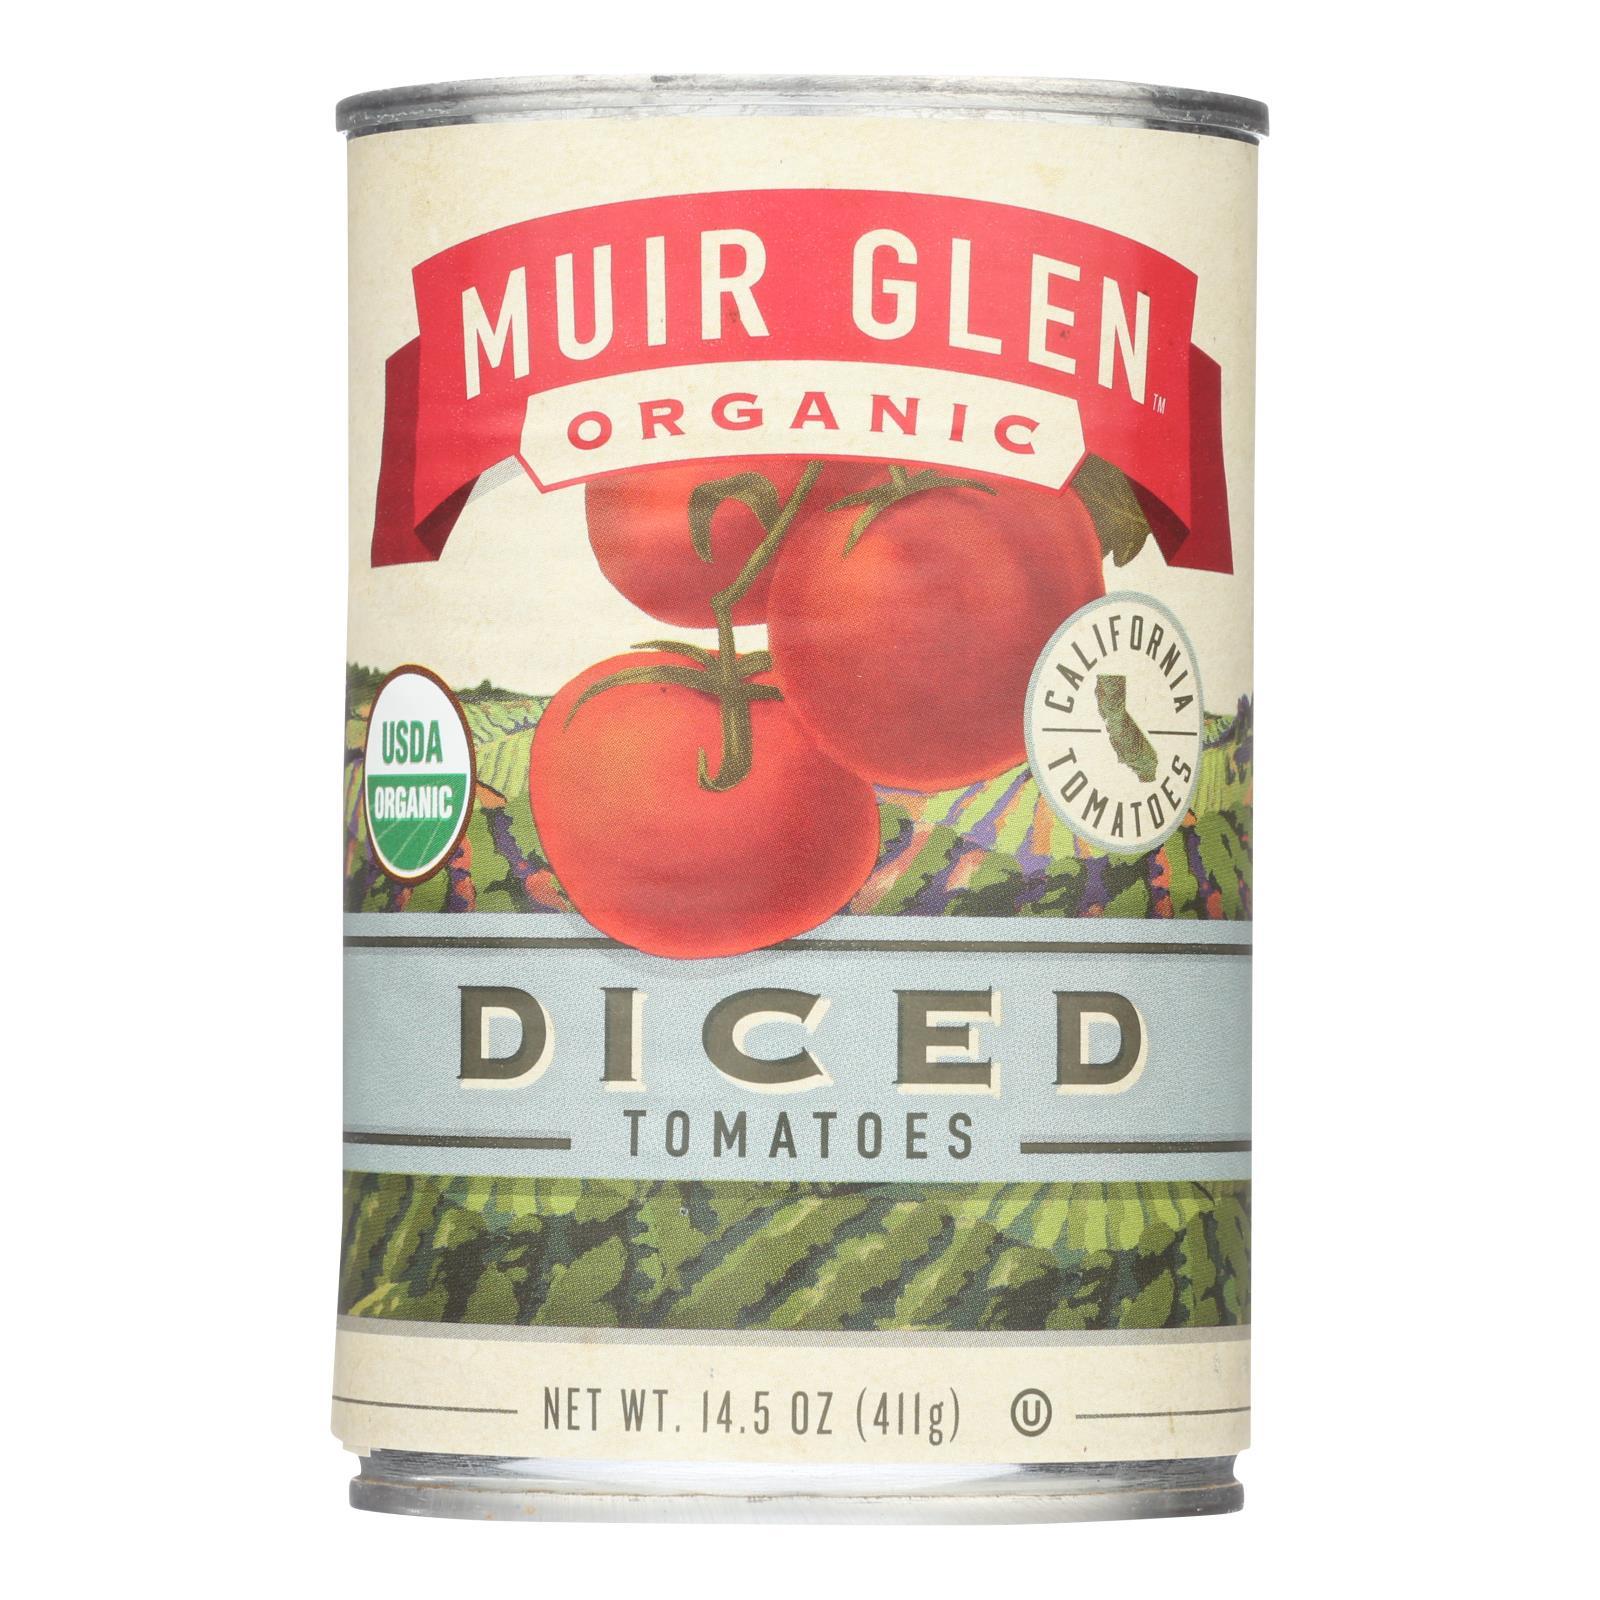 Muir Glen Organic Tomatoes Diced - Tomatoes - Case of 12 - 14.5 oz.